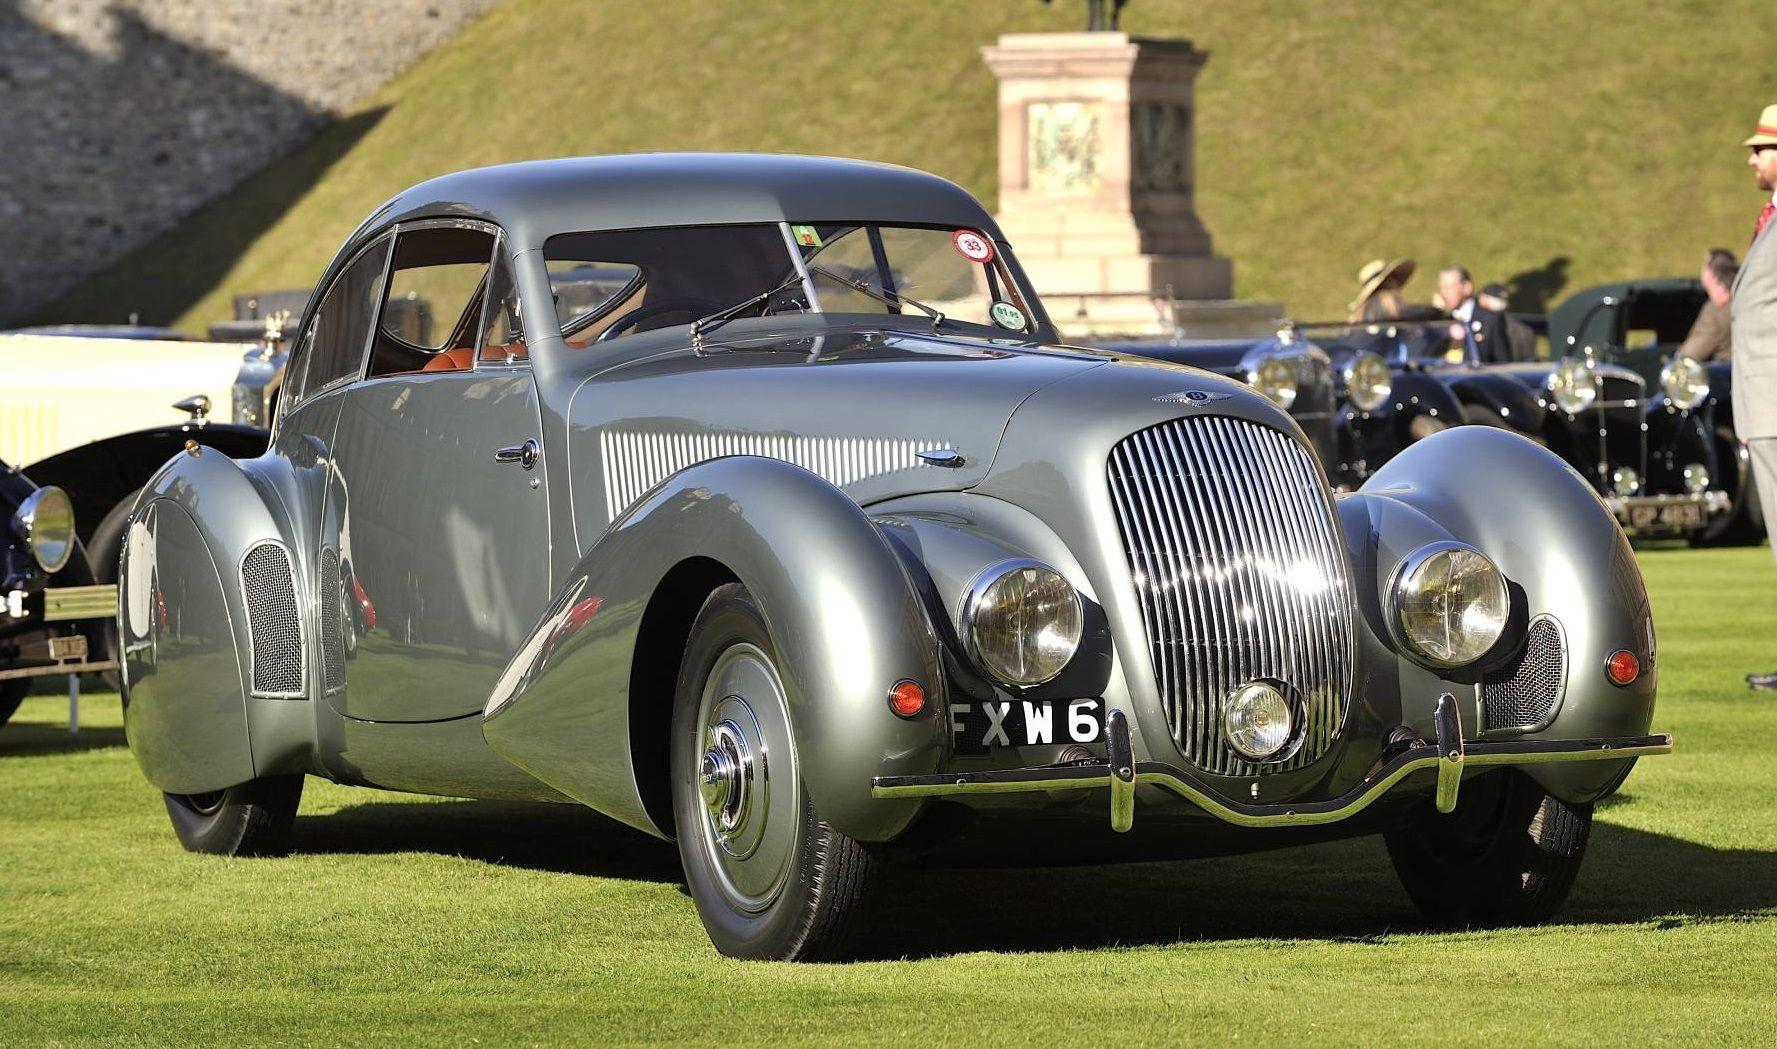 1938 Bentley Embiricos | classic cars - uk | Pinterest | Cars uk and ...